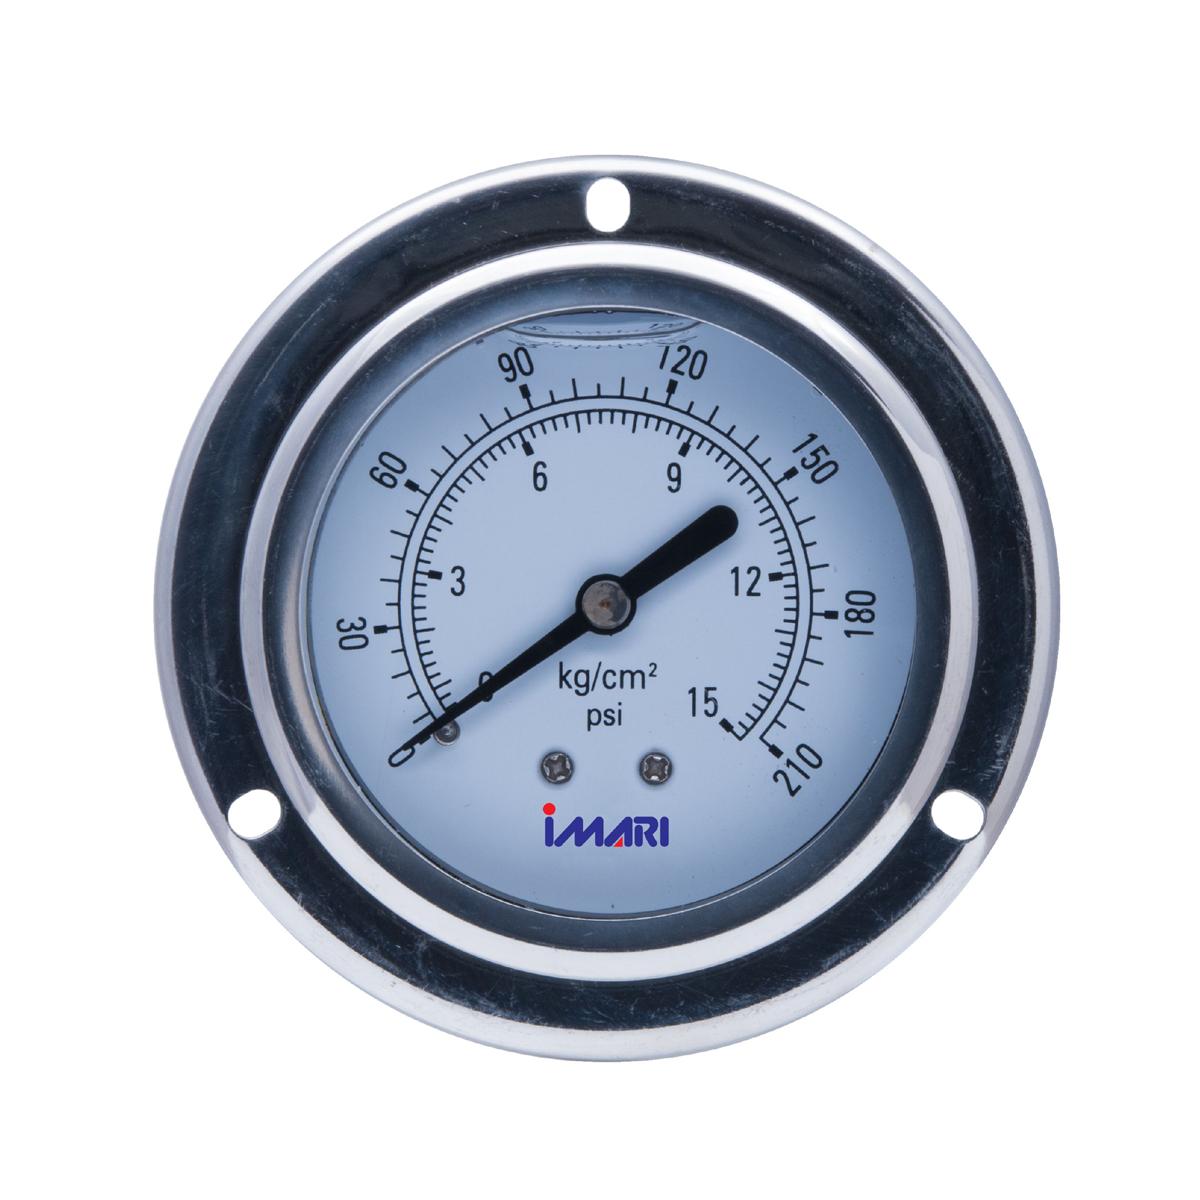 IMARI TYPE D (PRESSURE_Oil) เกจ์วัดความดันแบบมีน้ำมันหล่อกันกระเทือน